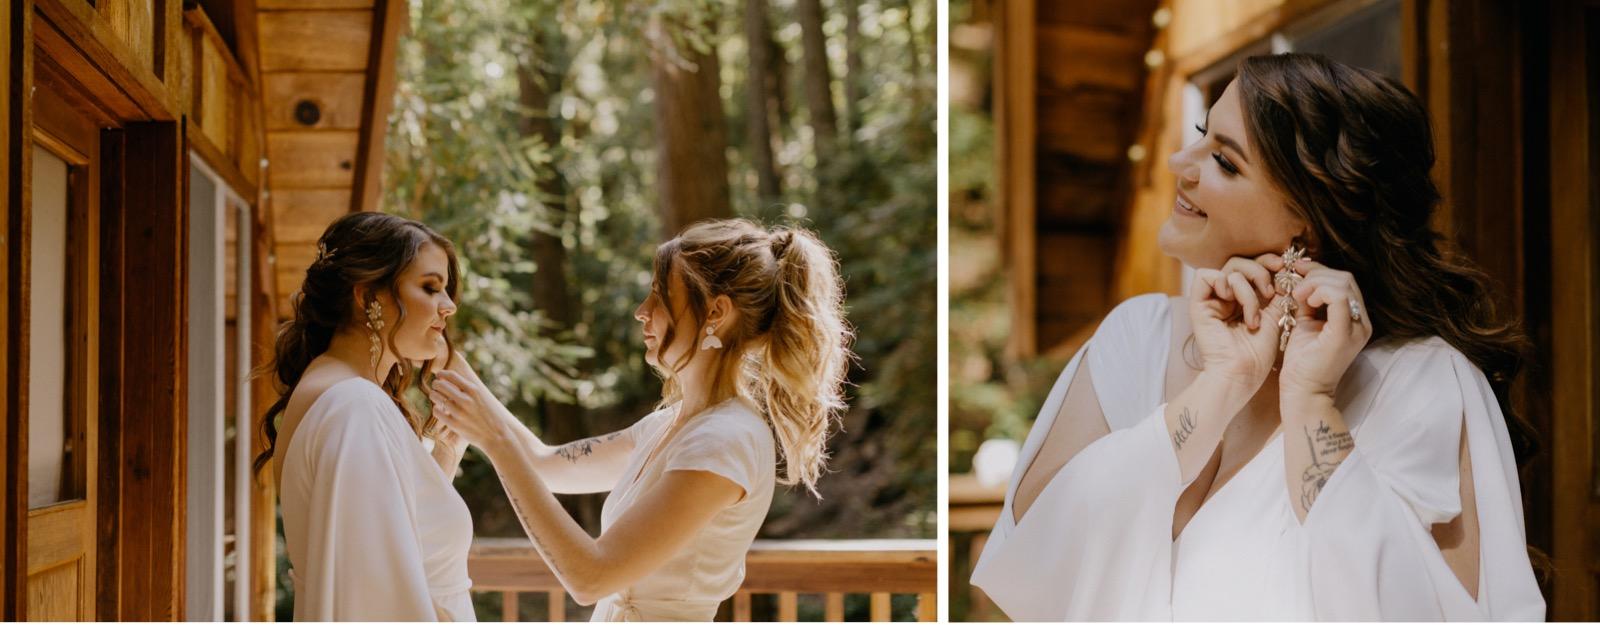 015_Emily & Jeff Wedding 0142_Emily & Jeff Wedding 0143_bride_forest_outdoor_getting-ready